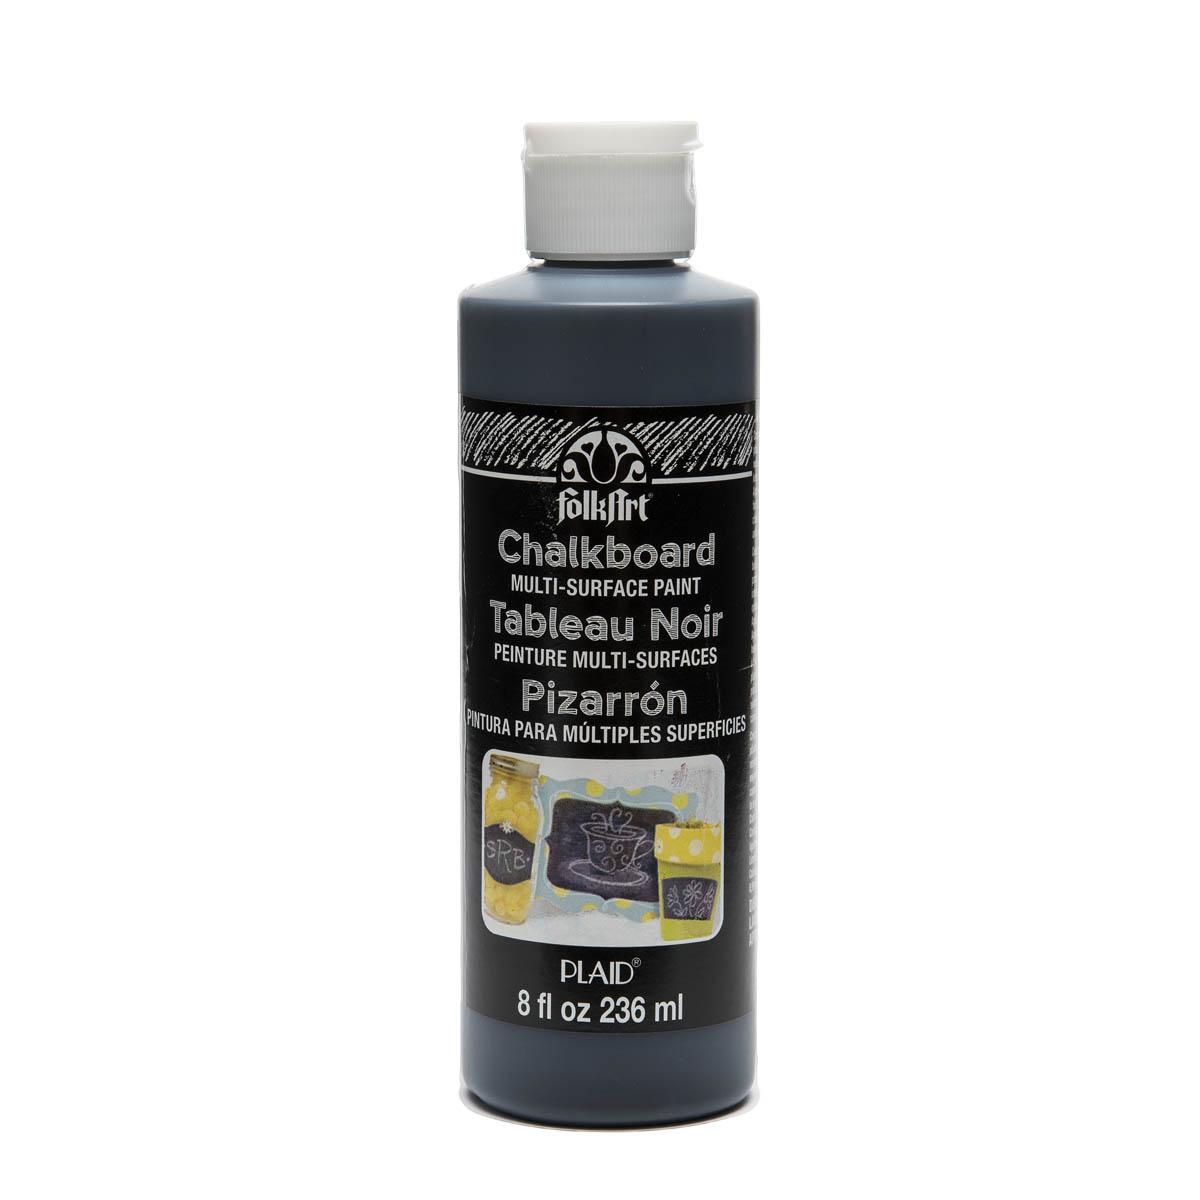 FolkArt ® Chalkboard Multi-Surface Paint - Black, 8 oz.